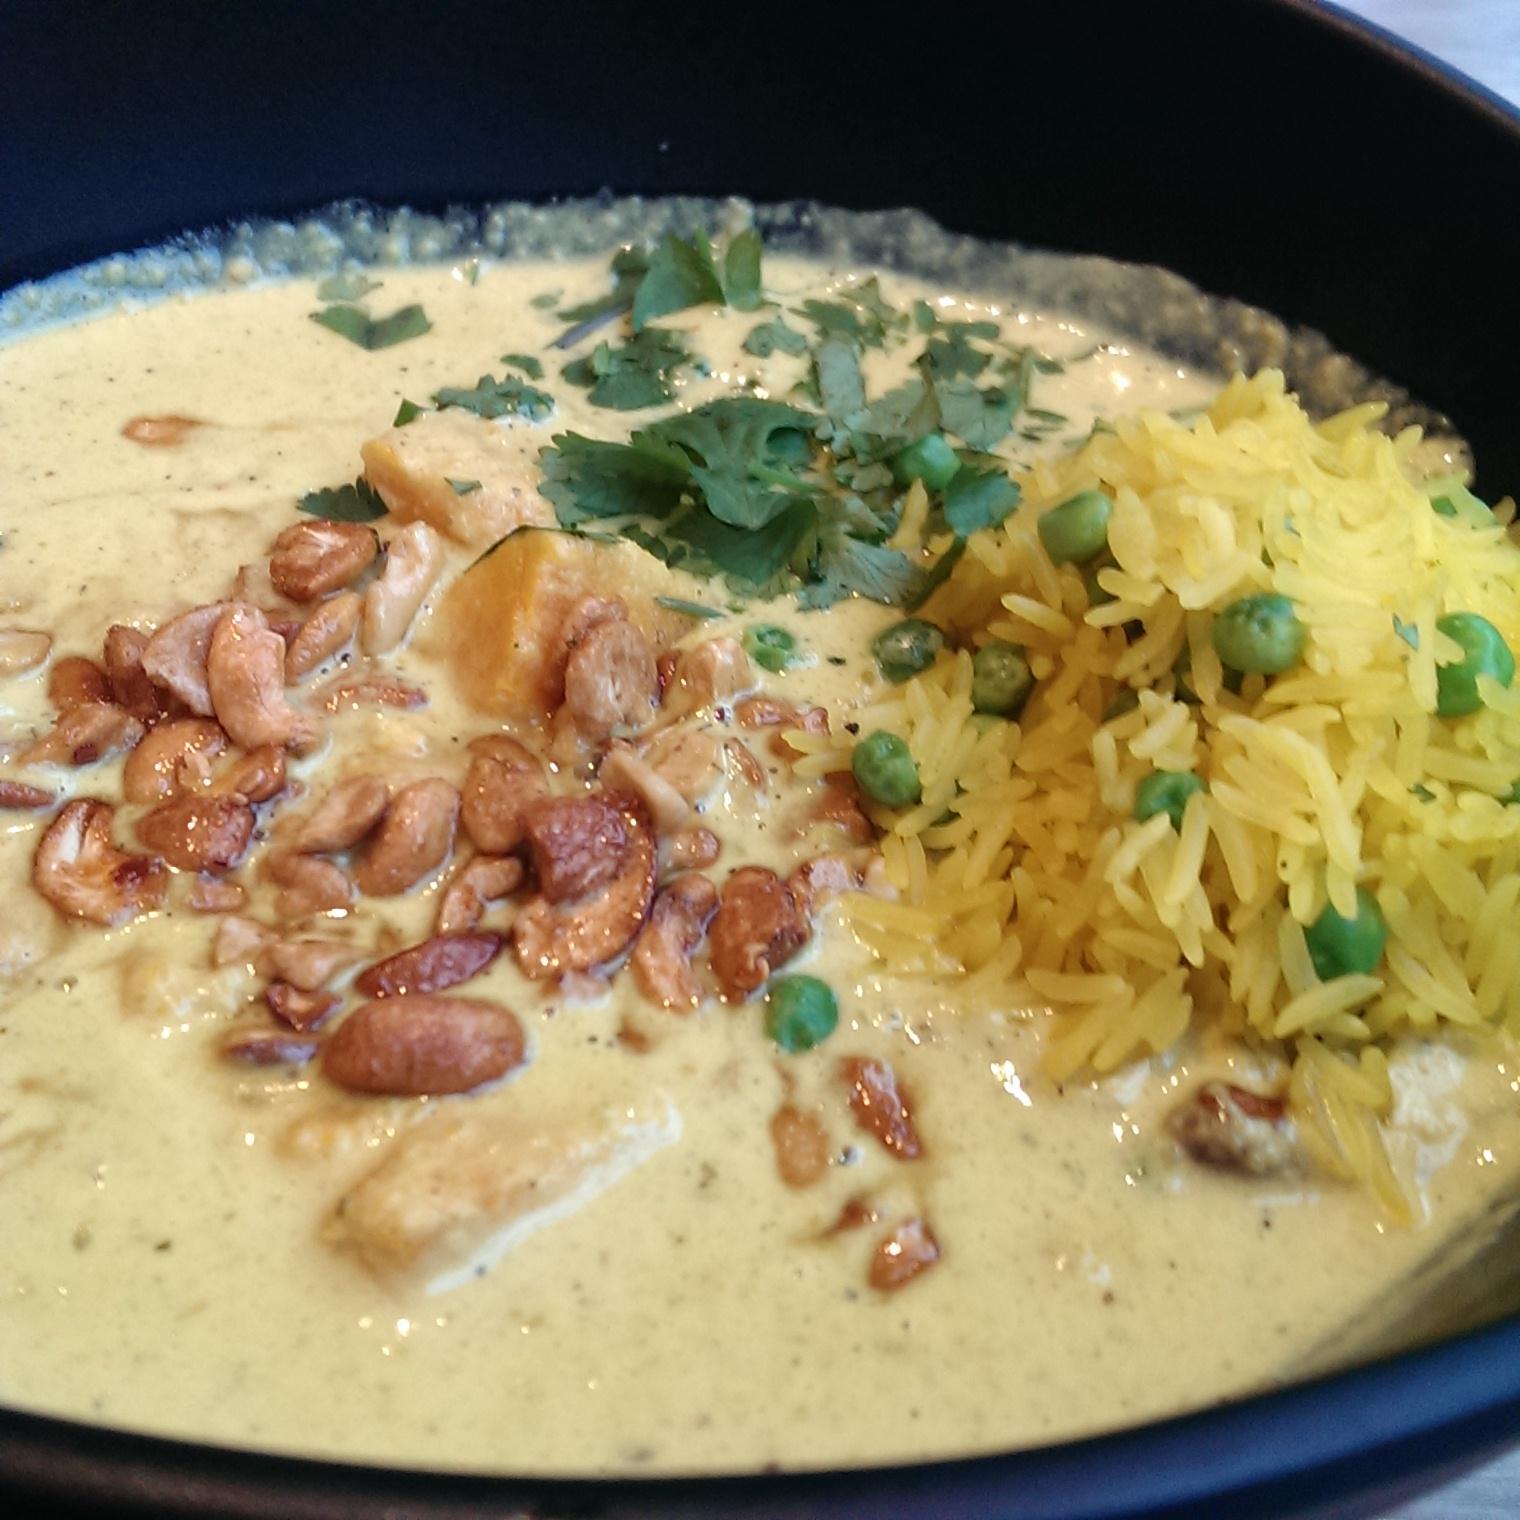 Sri Lanken sweet potato and cashew nut curry. Mildred's Restaurant, Camden